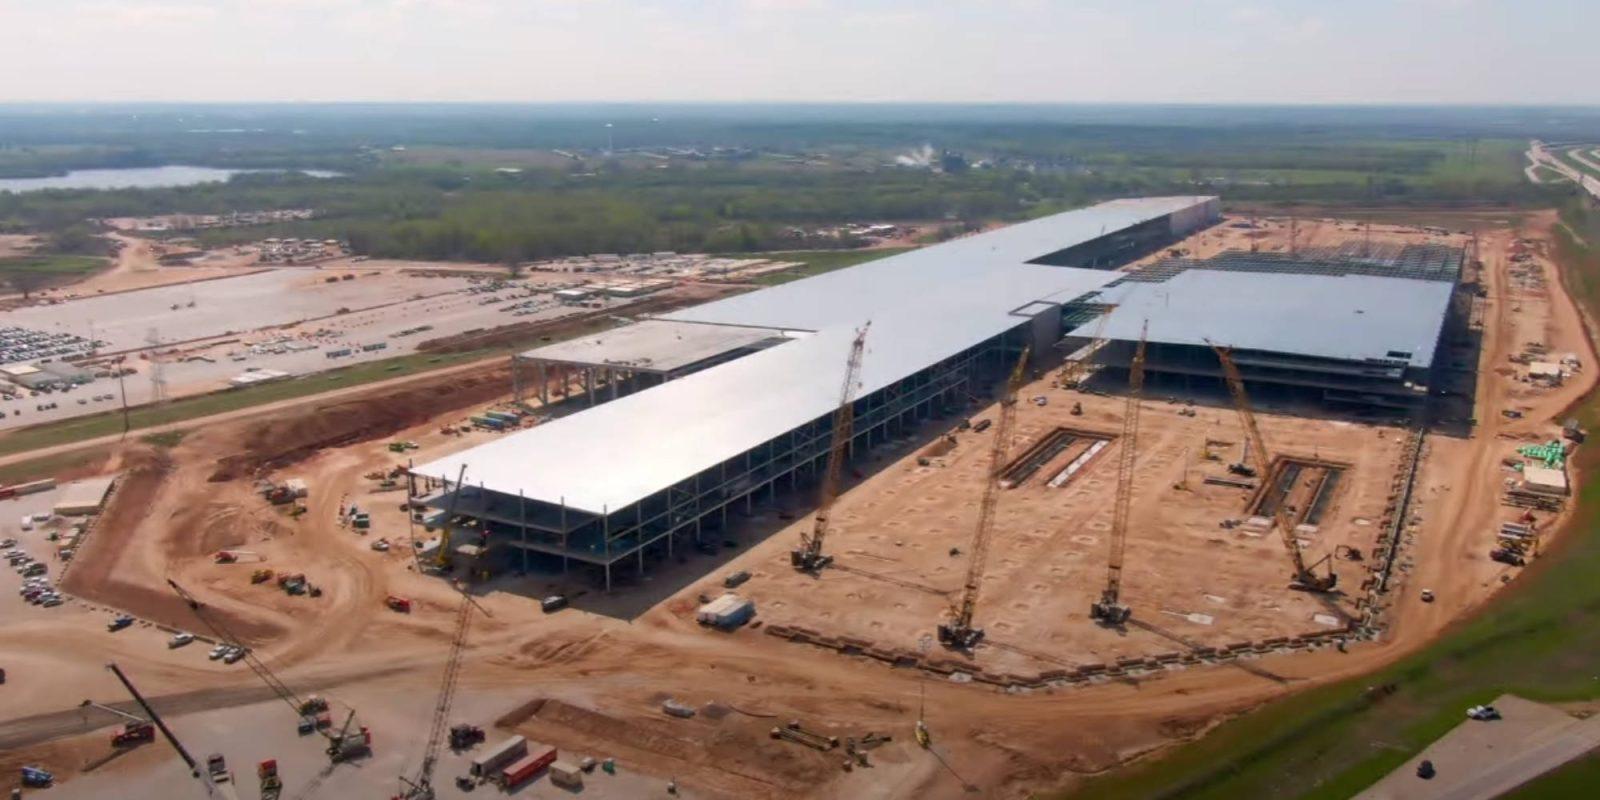 Tesla Texas Gigafactory drone construction update - DroneDJ